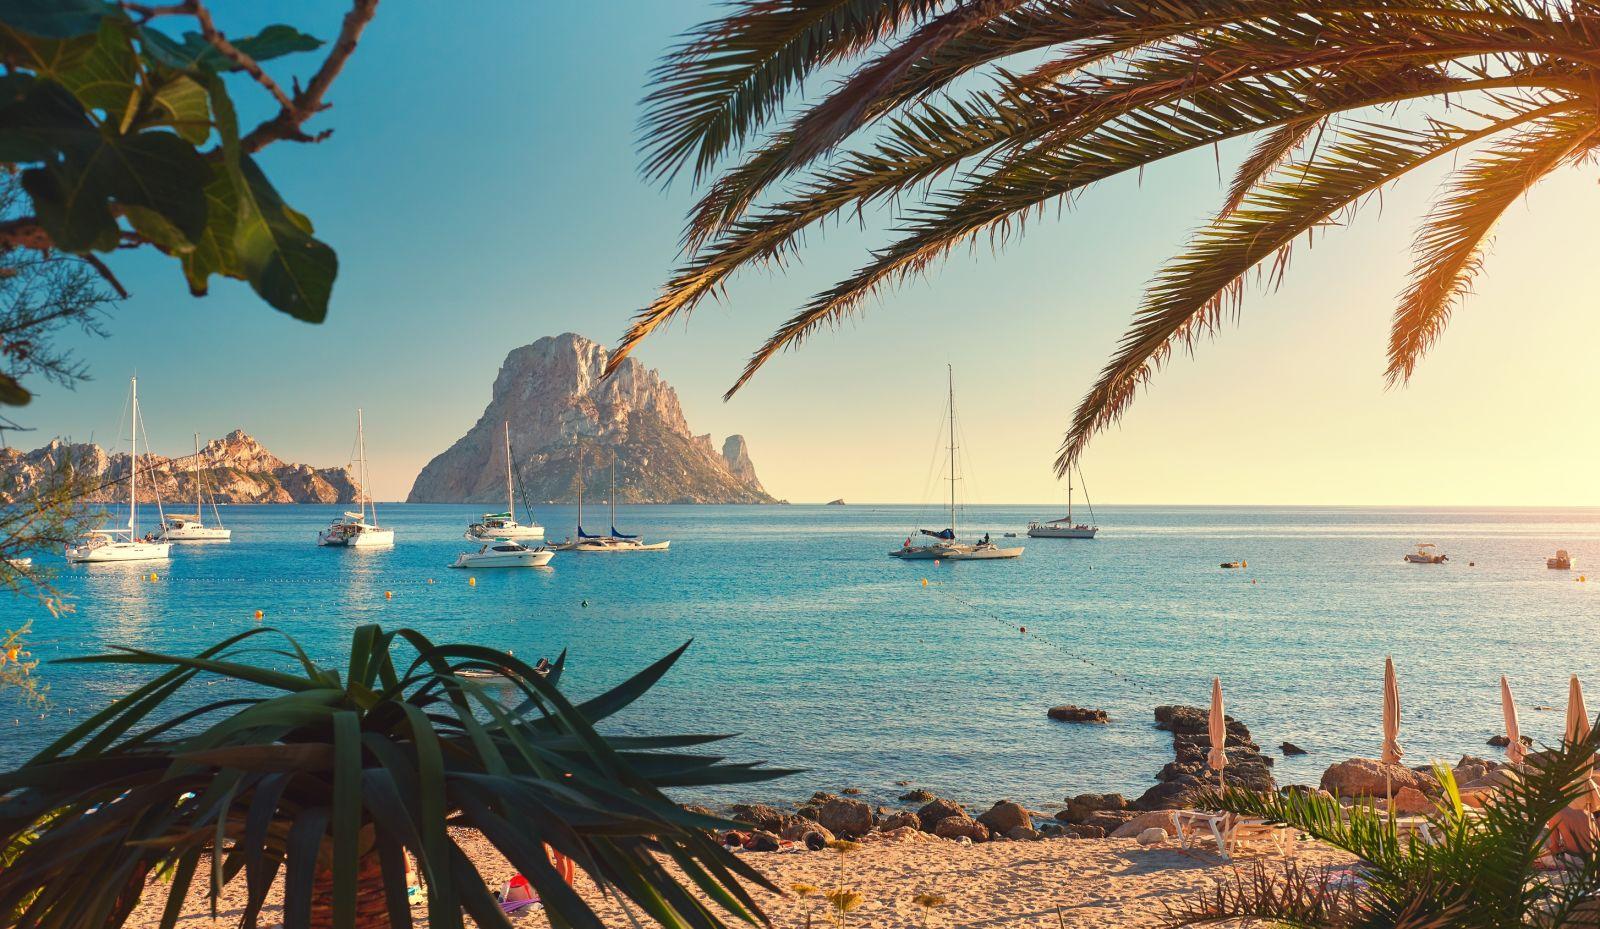 Cala d'horta, Ibiza